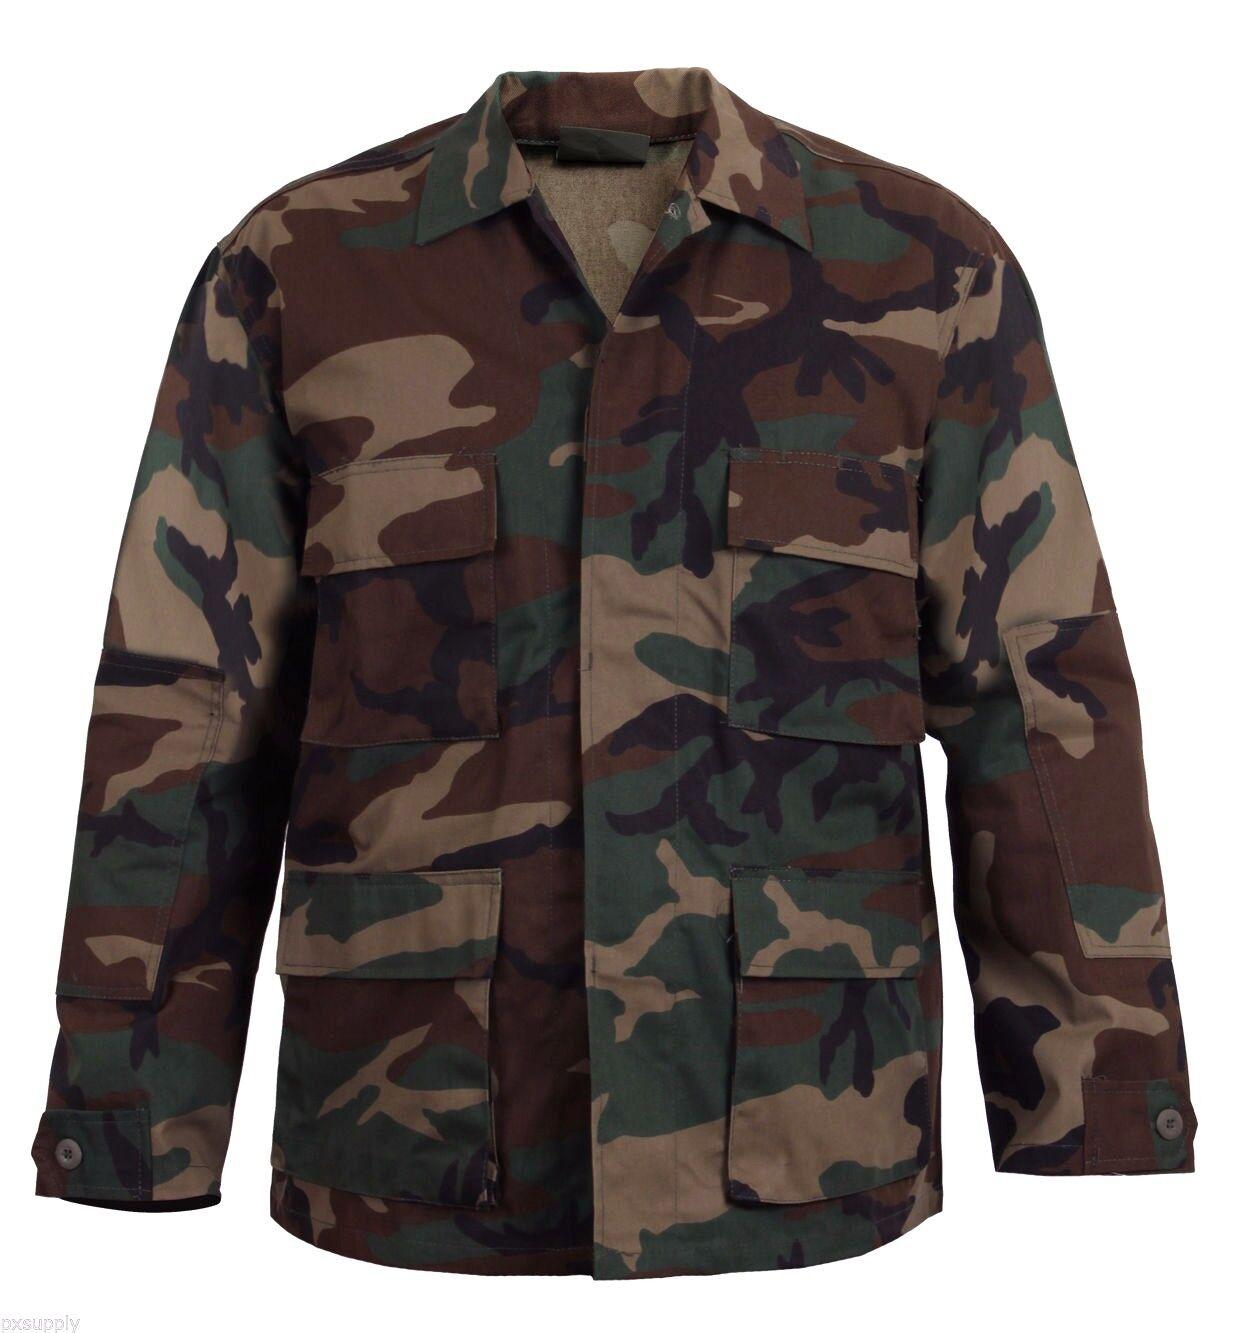 Woodland camo bdu shirt military style camouflage coat redhco 7940